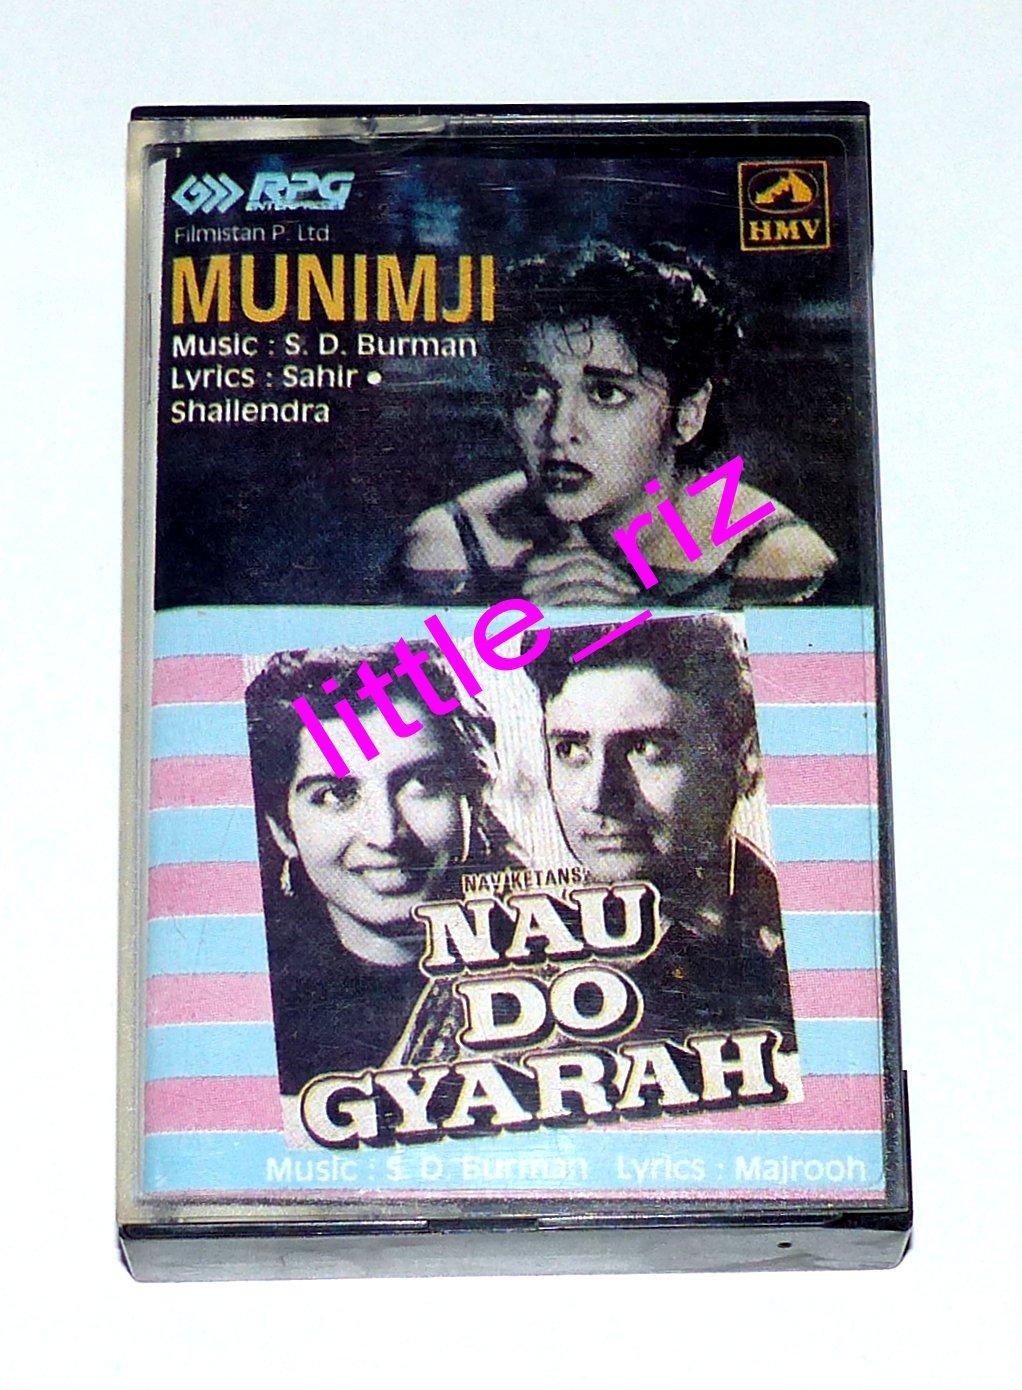 Munimji (1955) / Nau Do Gyarah (1957) - Bollywood Indian Cassette Tape S.D. Burman